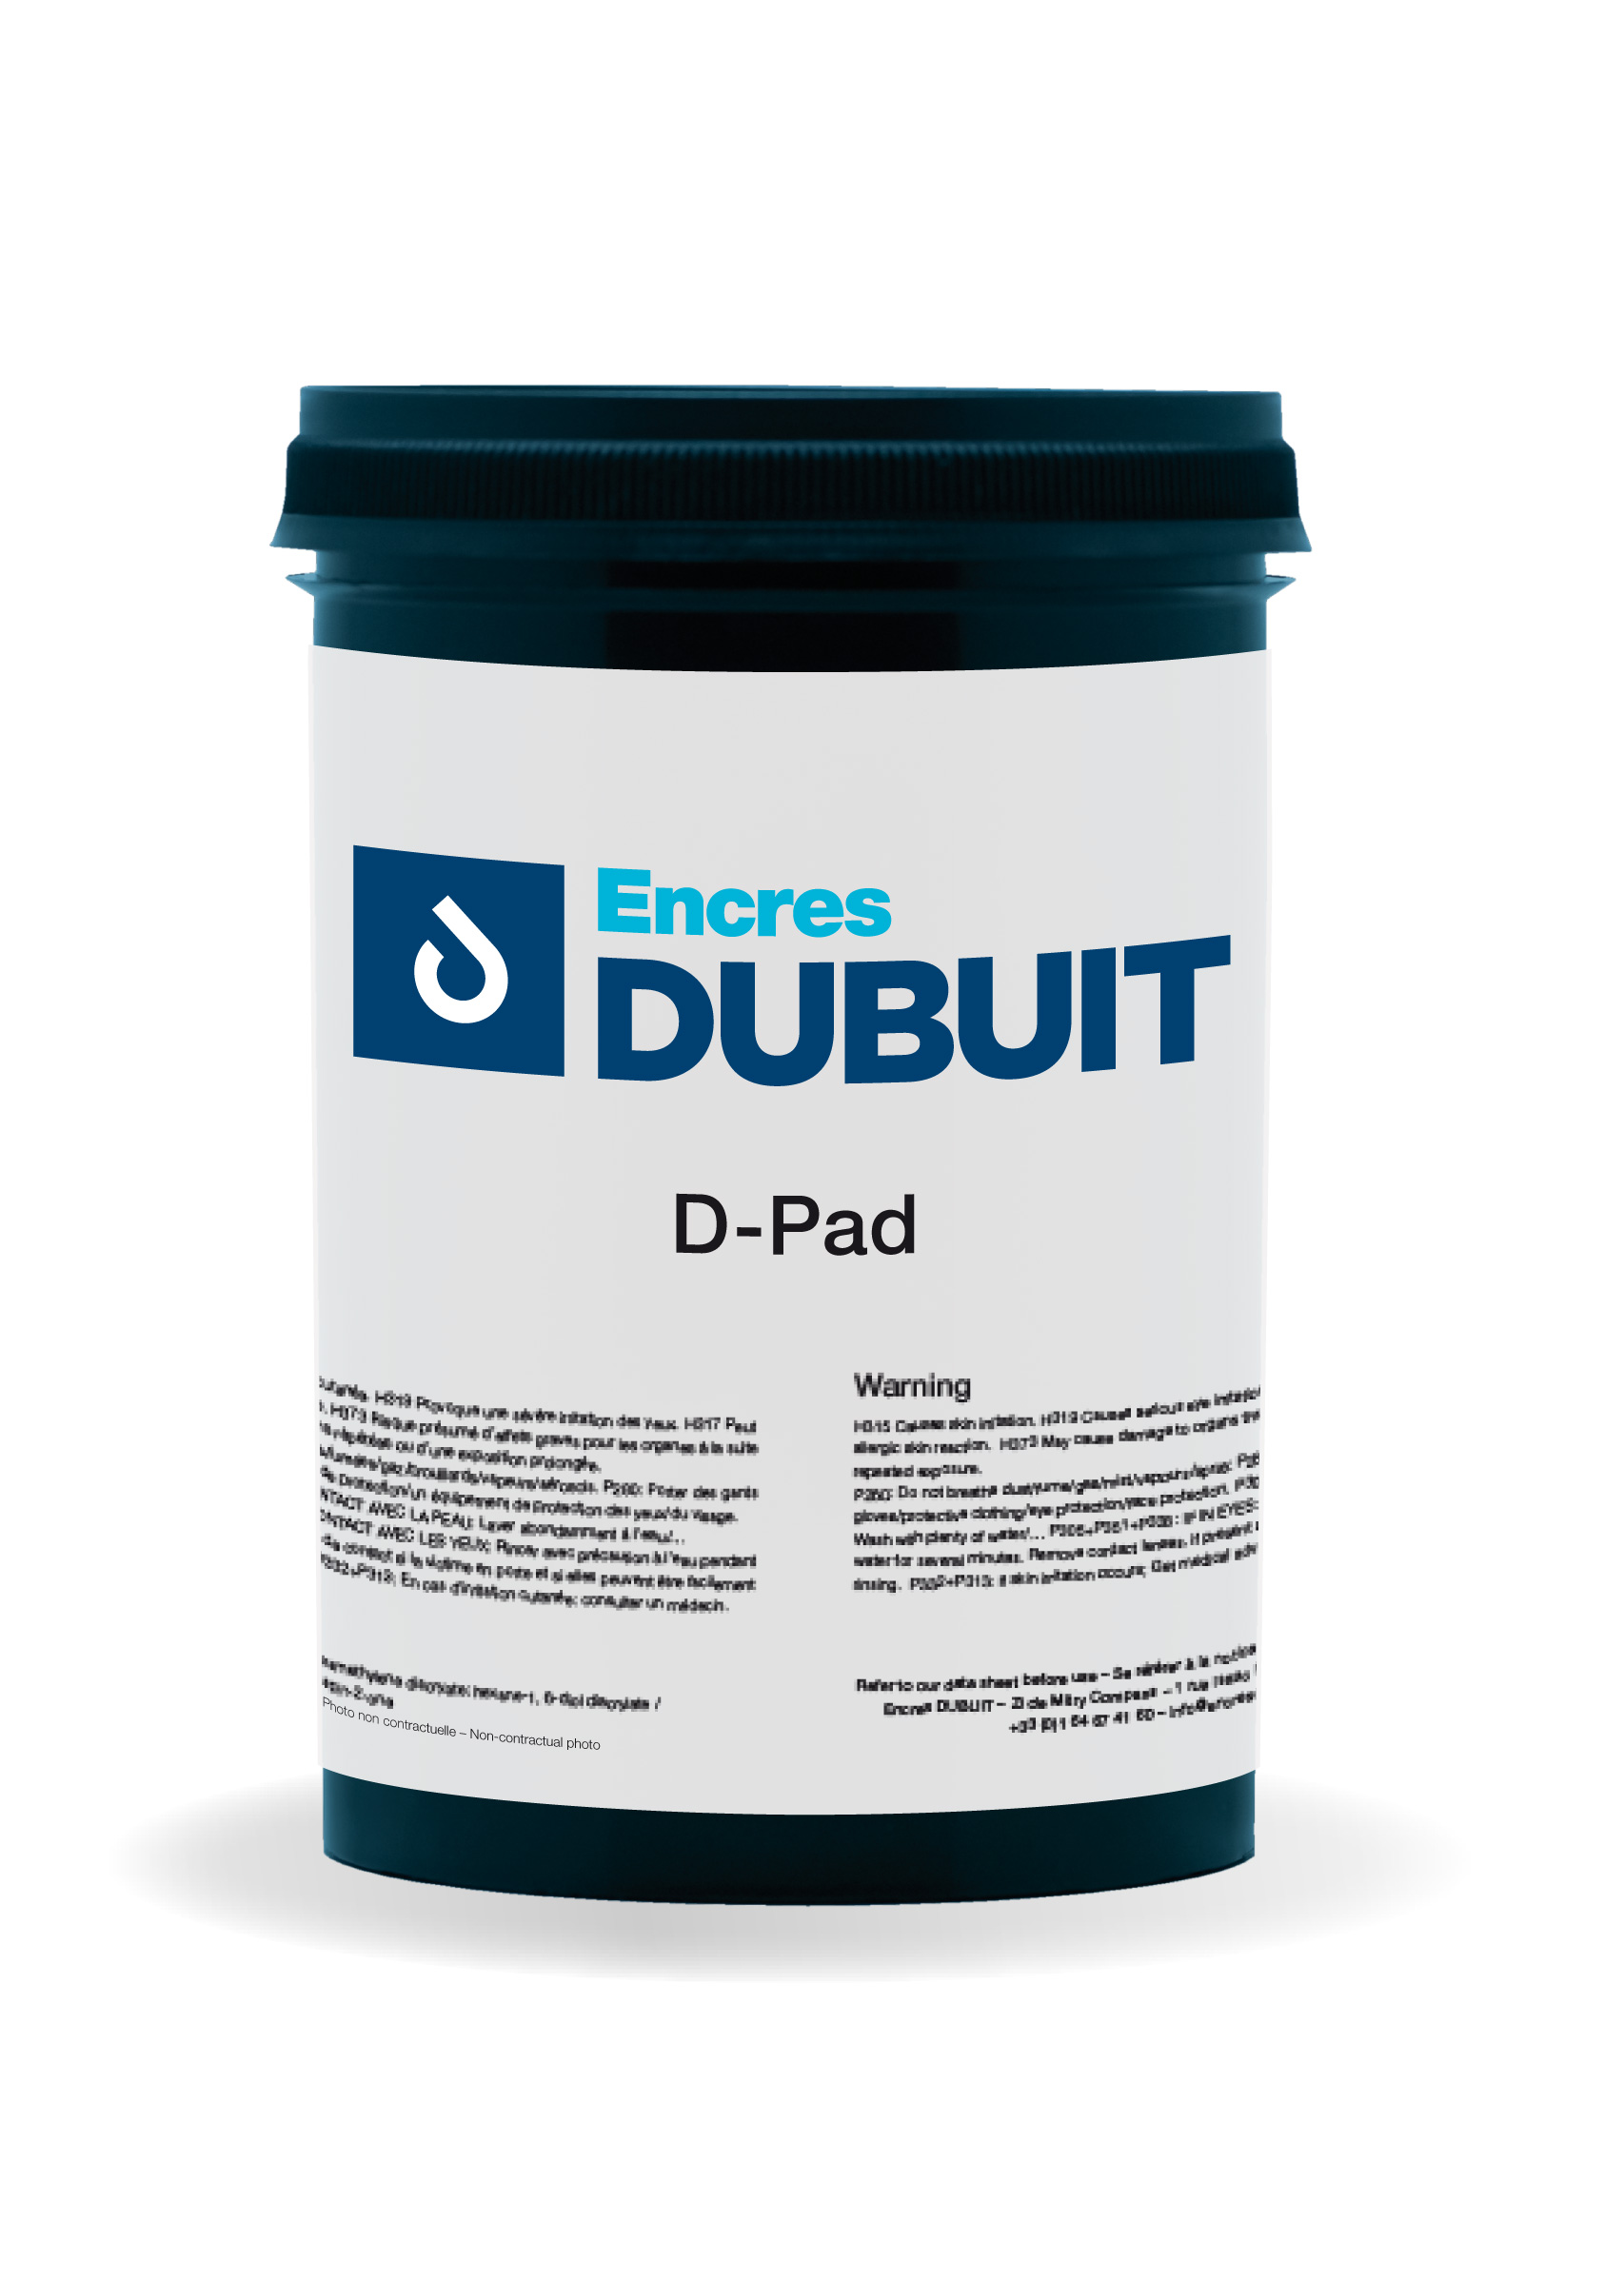 D-PAD Encres DUBUIT Pad Printing Ink